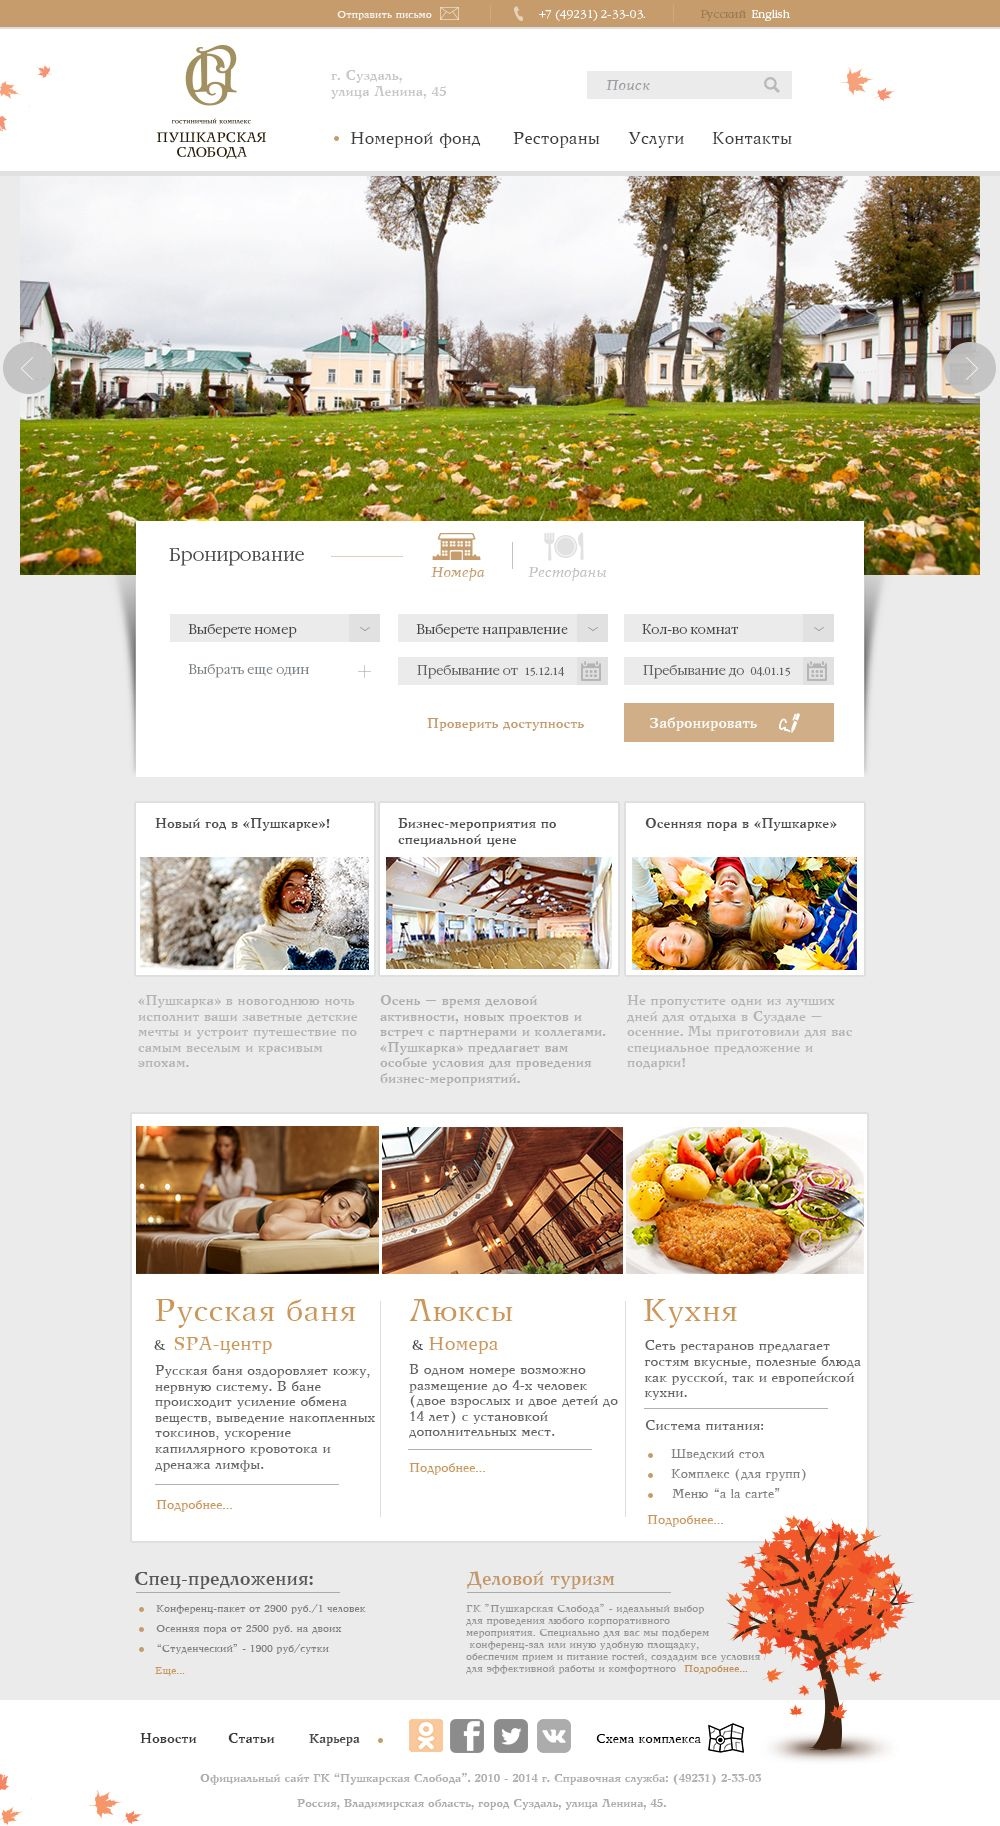 Сайт Пушкарской Слободы - дизайнер Daaa_RBK